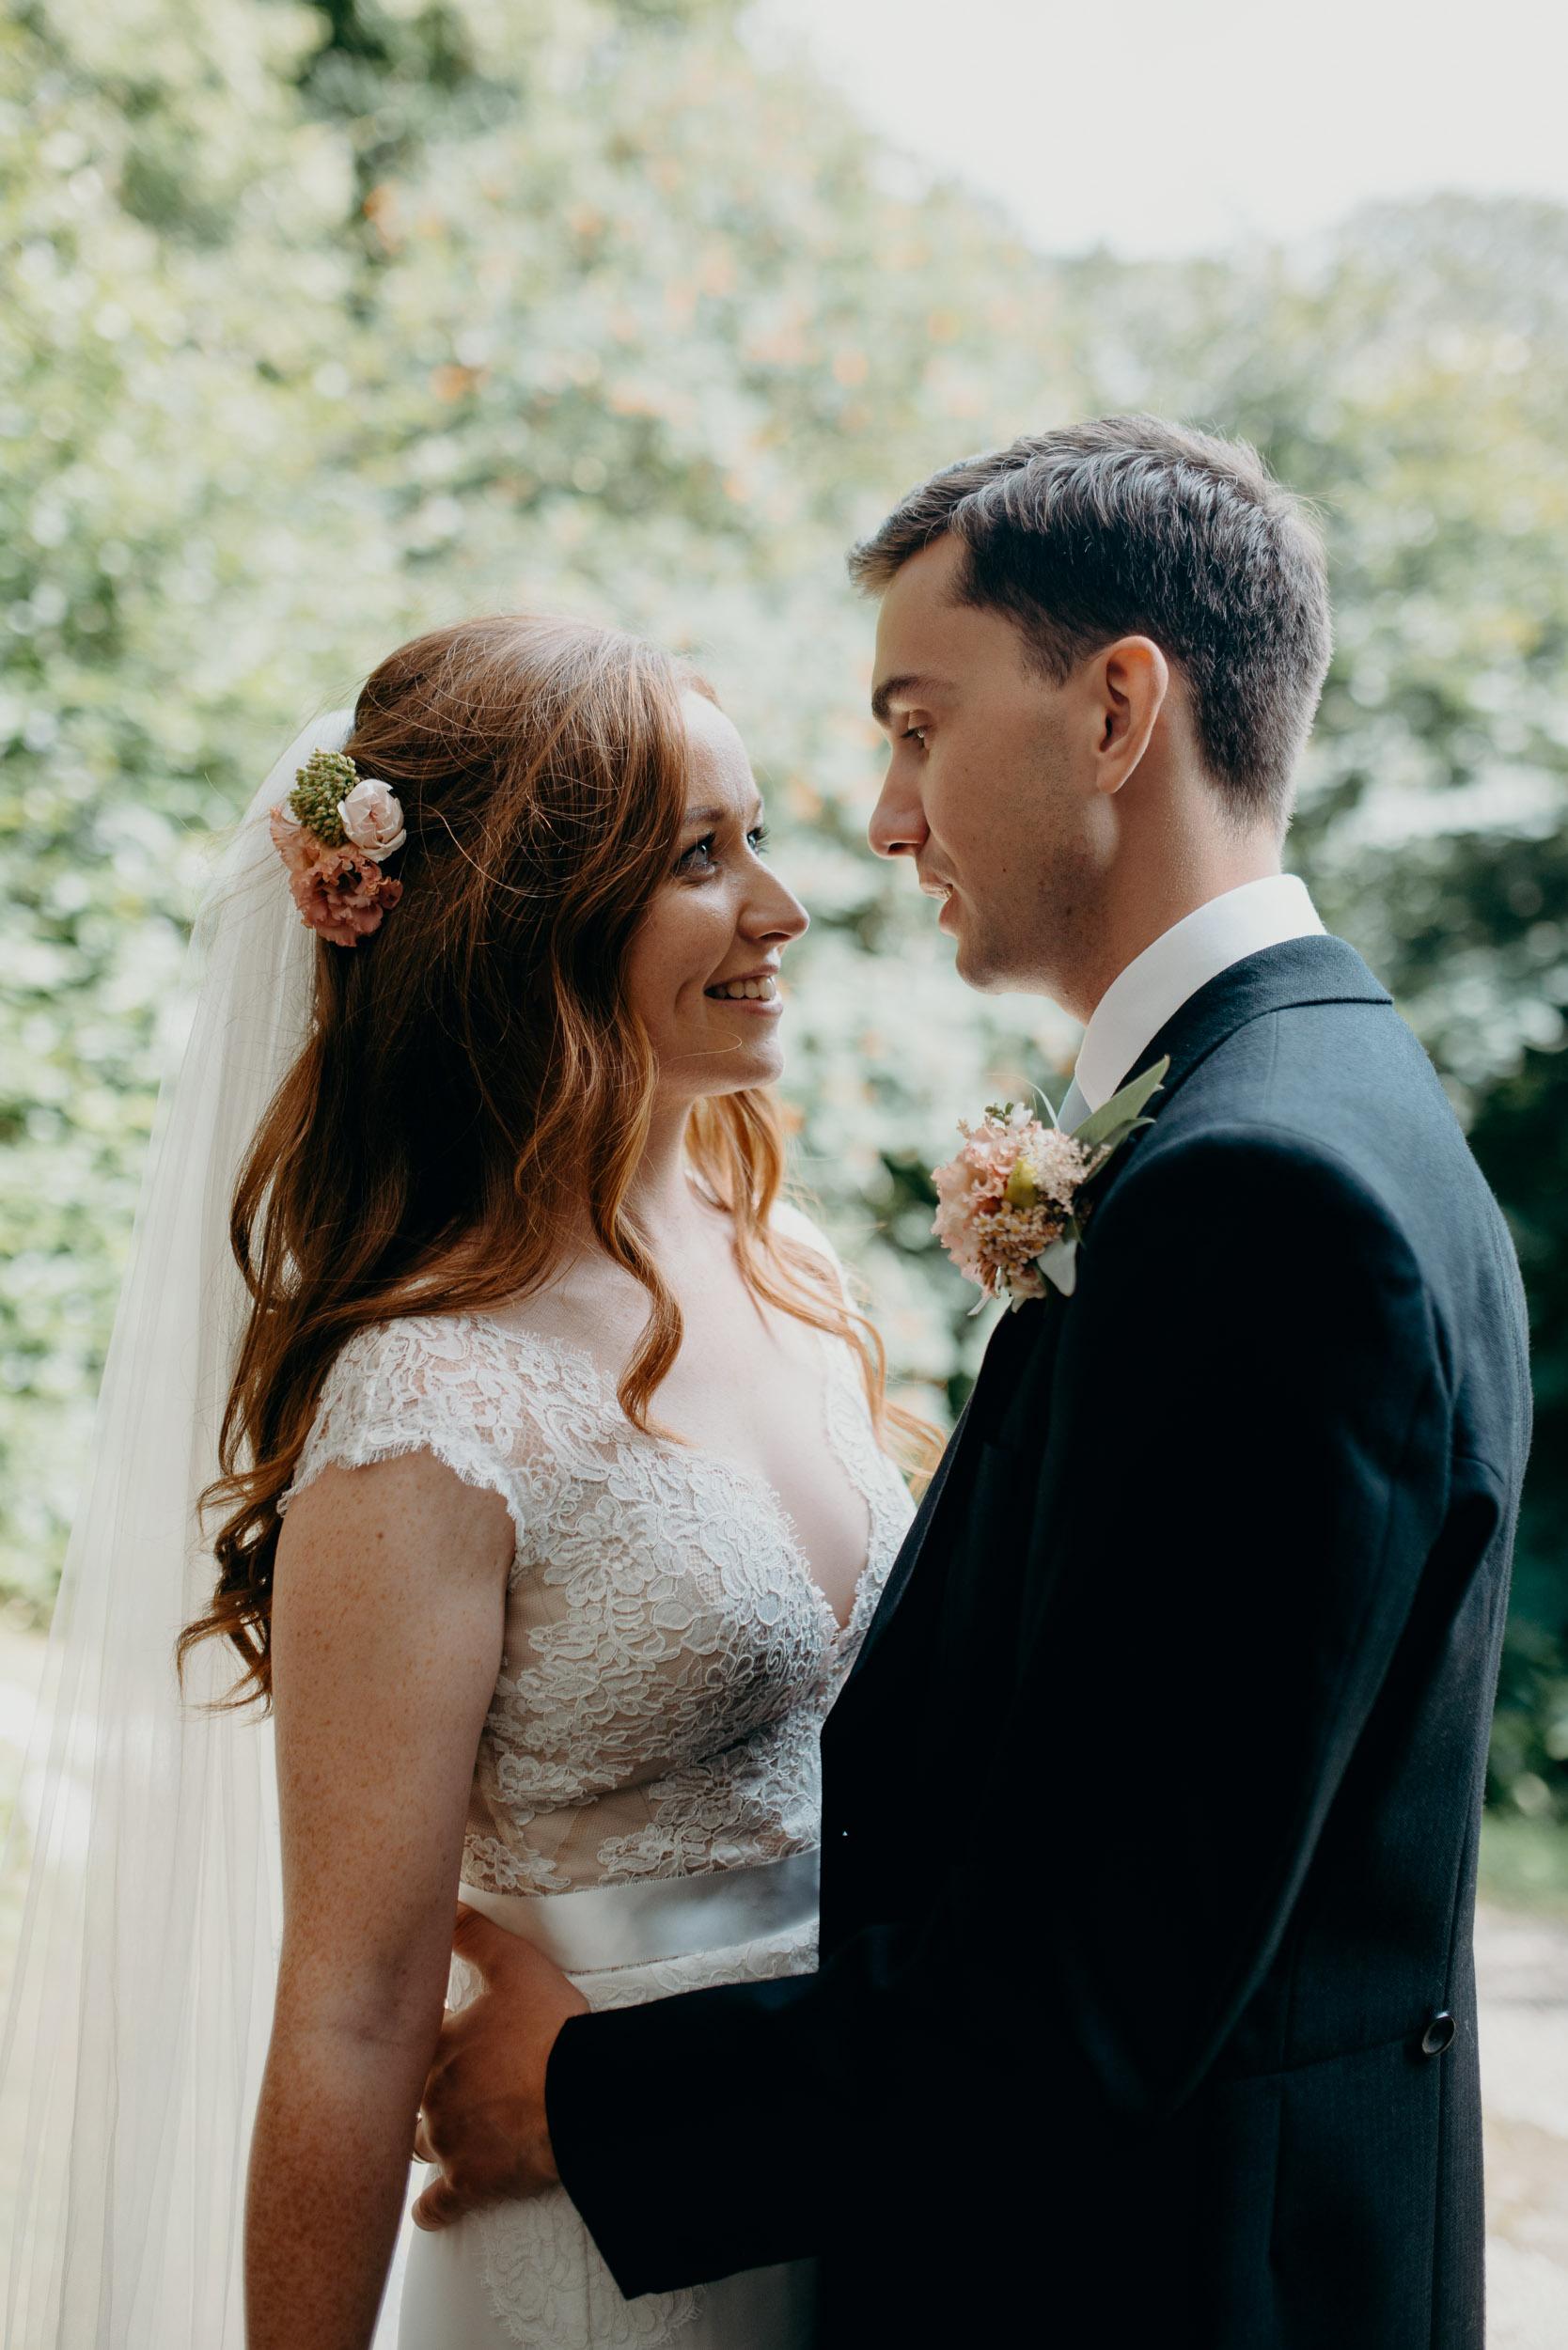 drenagh estate wedding photography-78.jpg